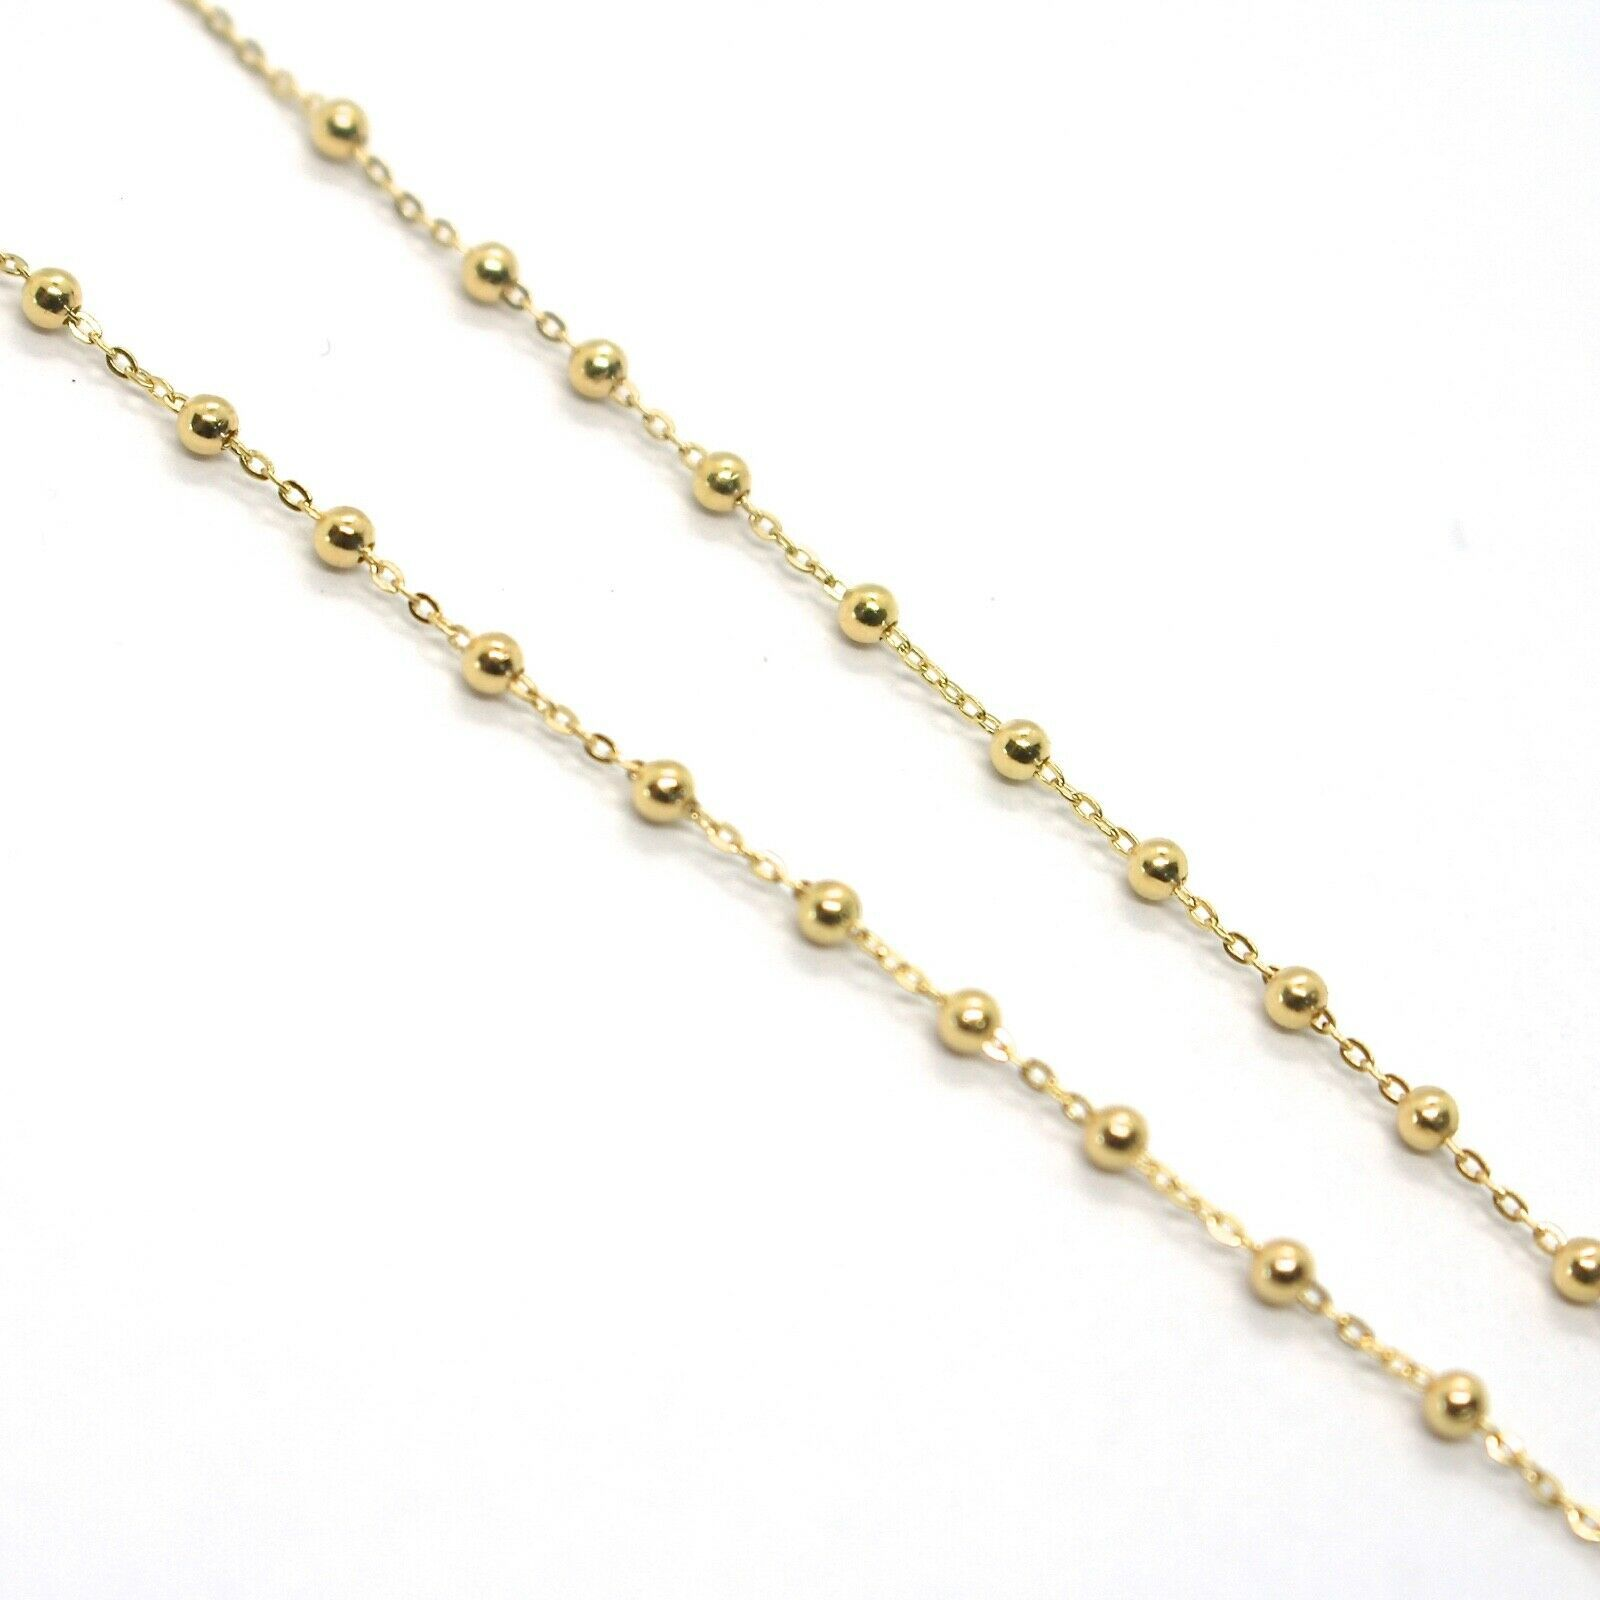 Mini Collar Rosario Oro Amarillo 750 18K, Medalla Milagrosa, Cruz, 48 CM image 5